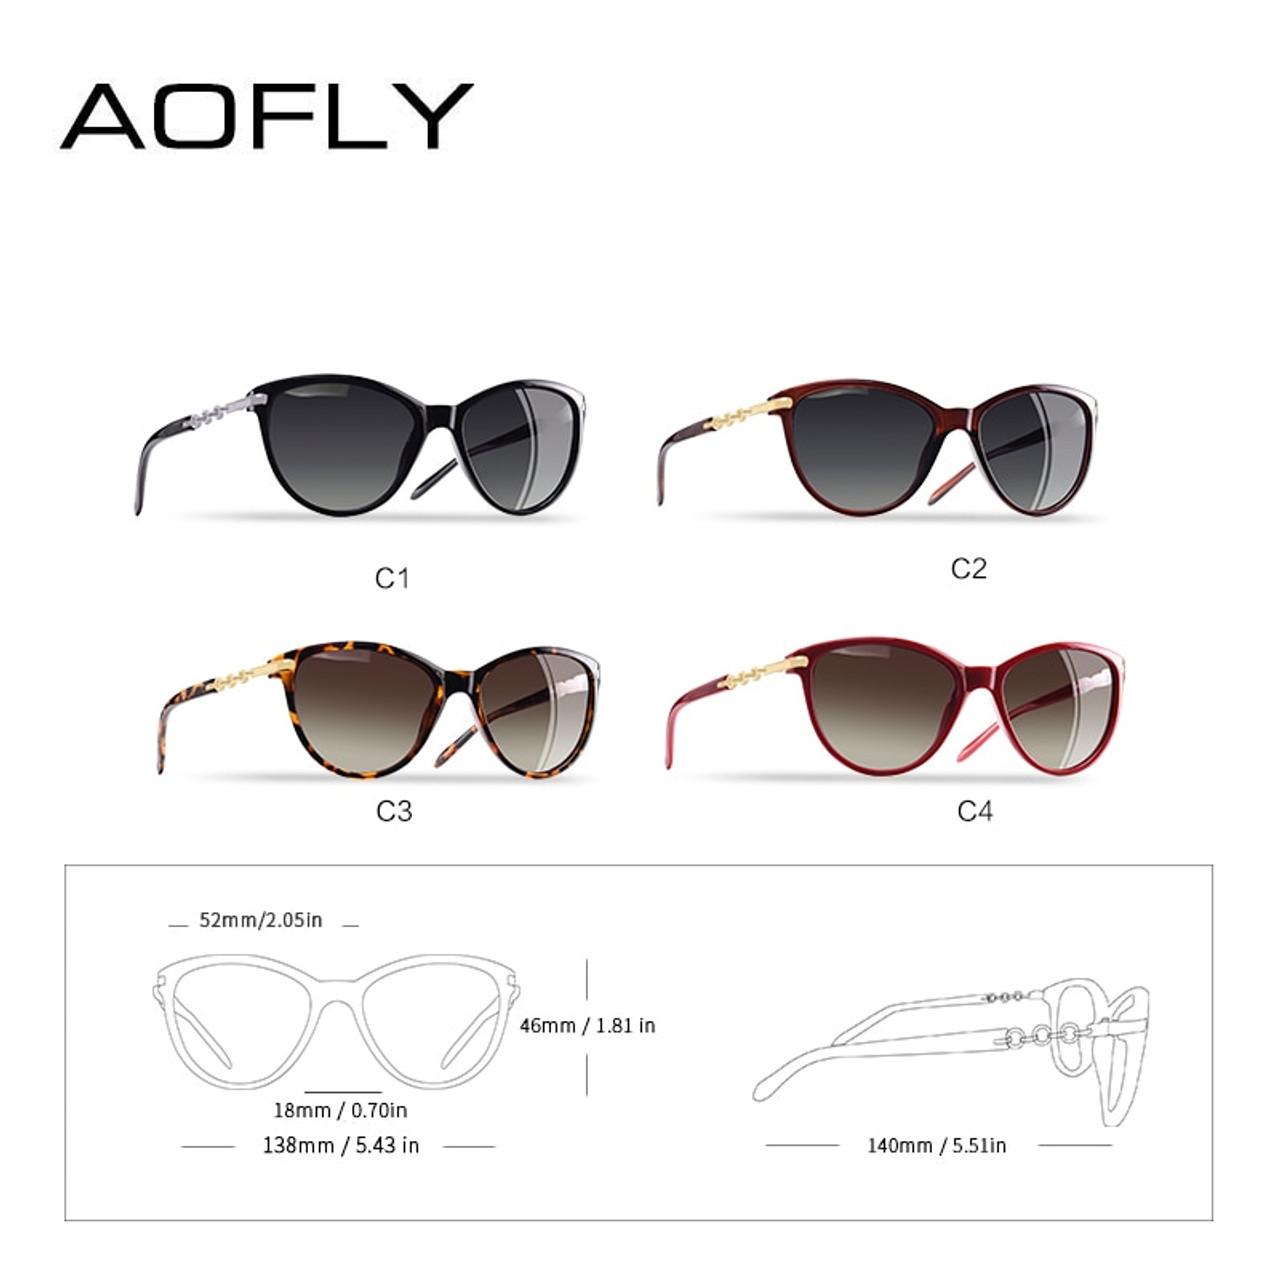 876275de47 AOFLY BRAND DESIGN Cat Eye Polarized Sunglasses Women Polarized Sun Glasses  Female Gradient Shades Oculos Feminino UV400